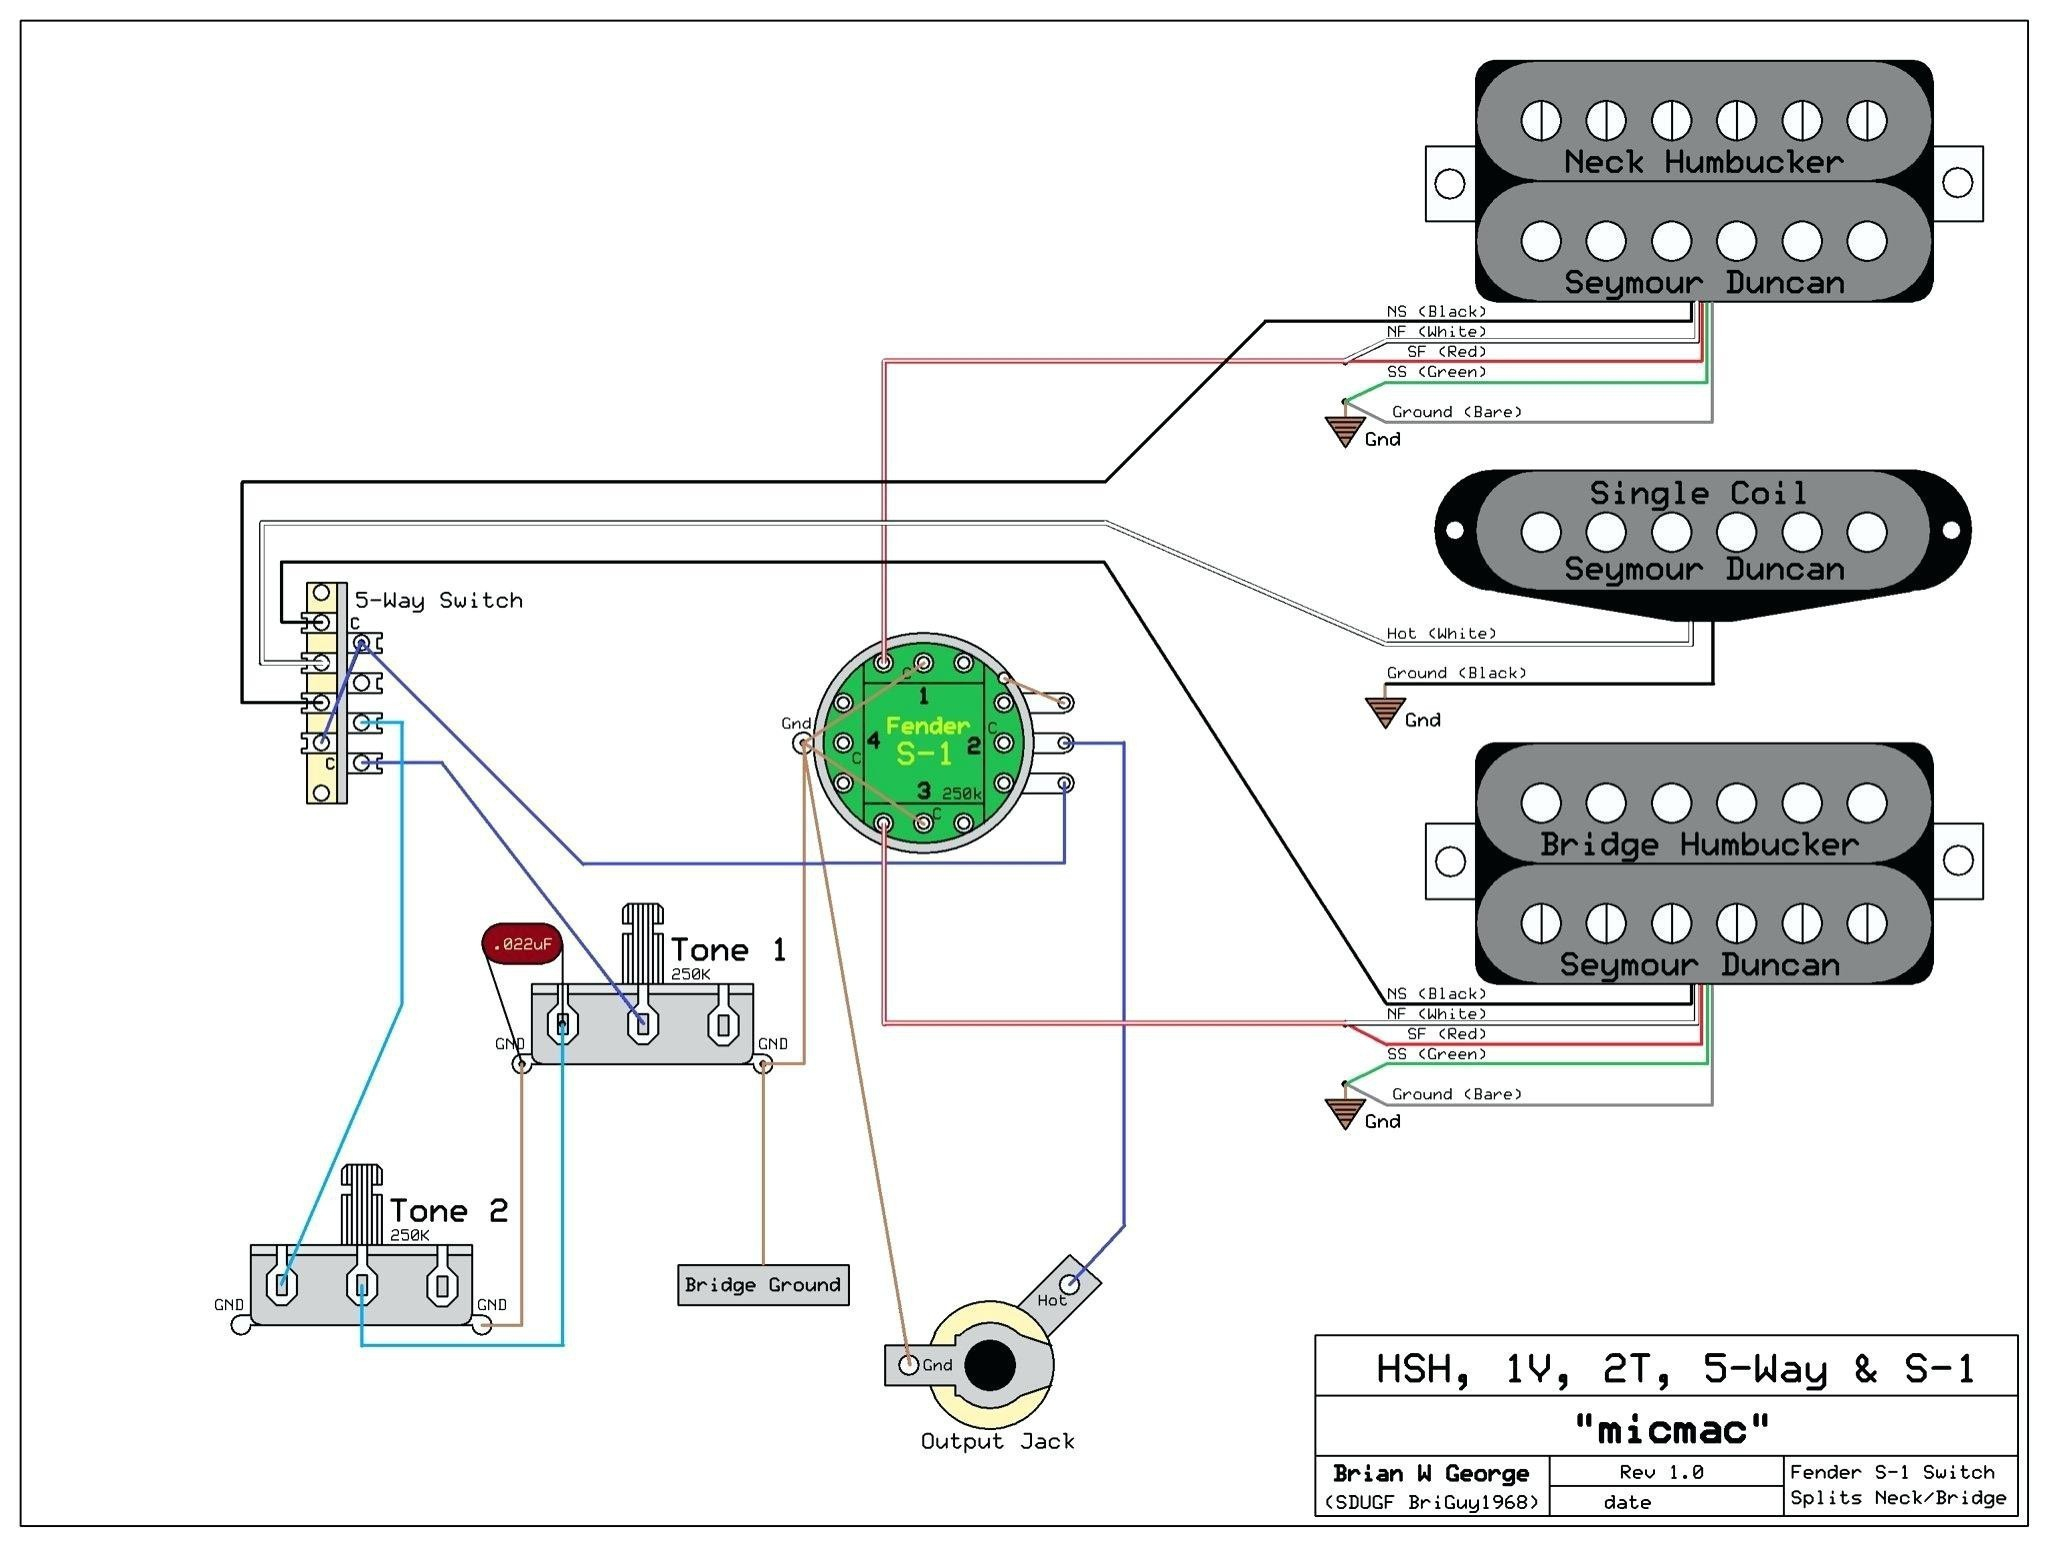 Emg Select Wiring Diagram | Schematic Diagram - Emg 81 85 Wiring Diagram